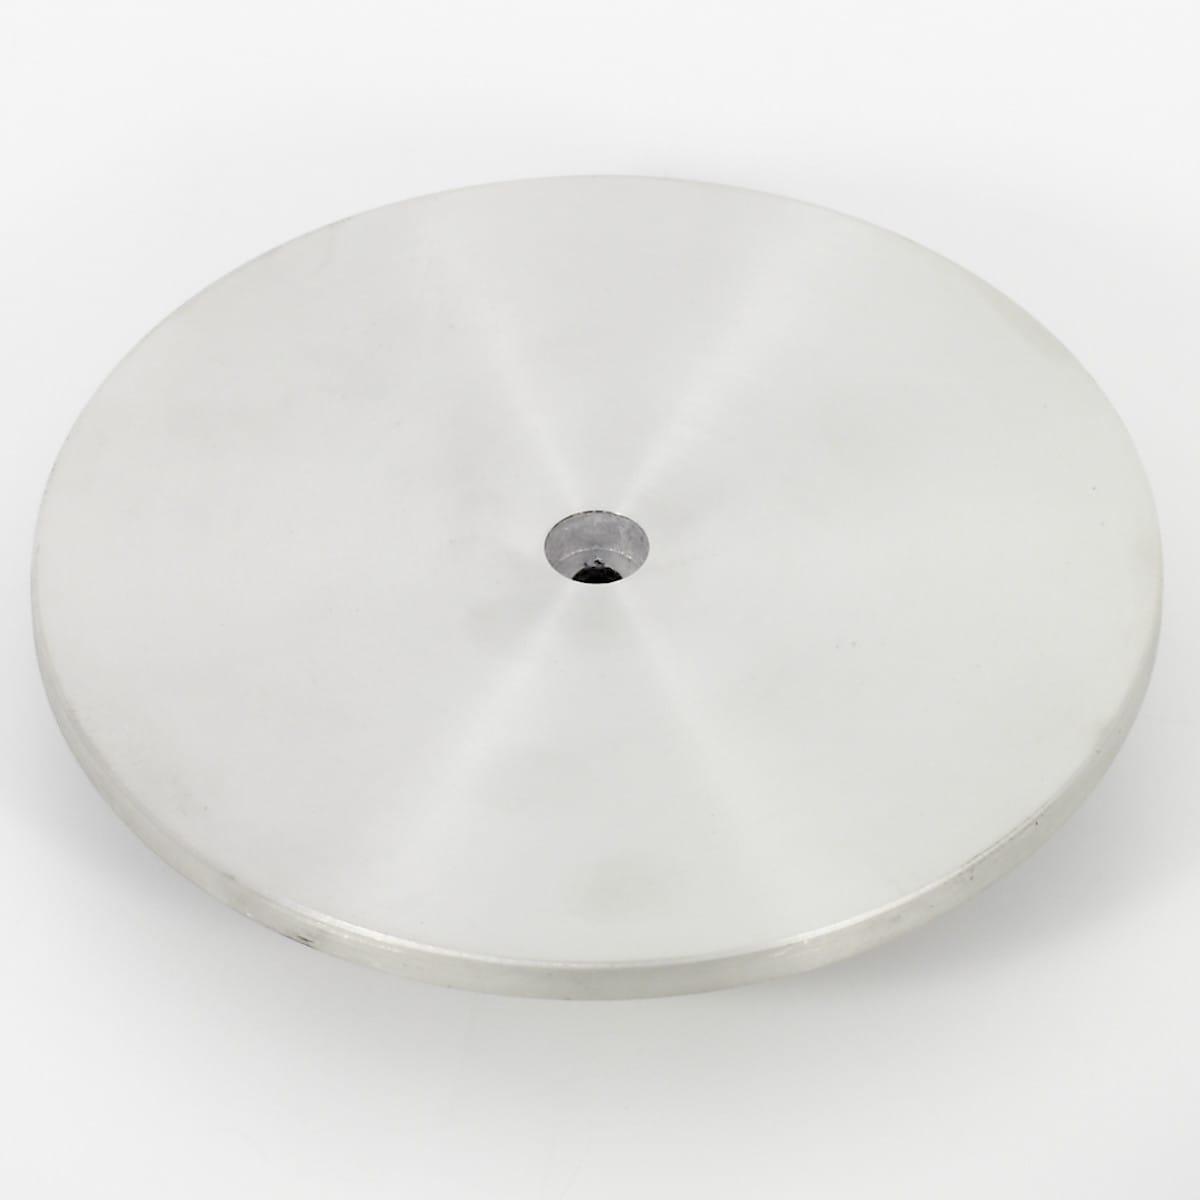 ABRASIVE PLATE  Cotech